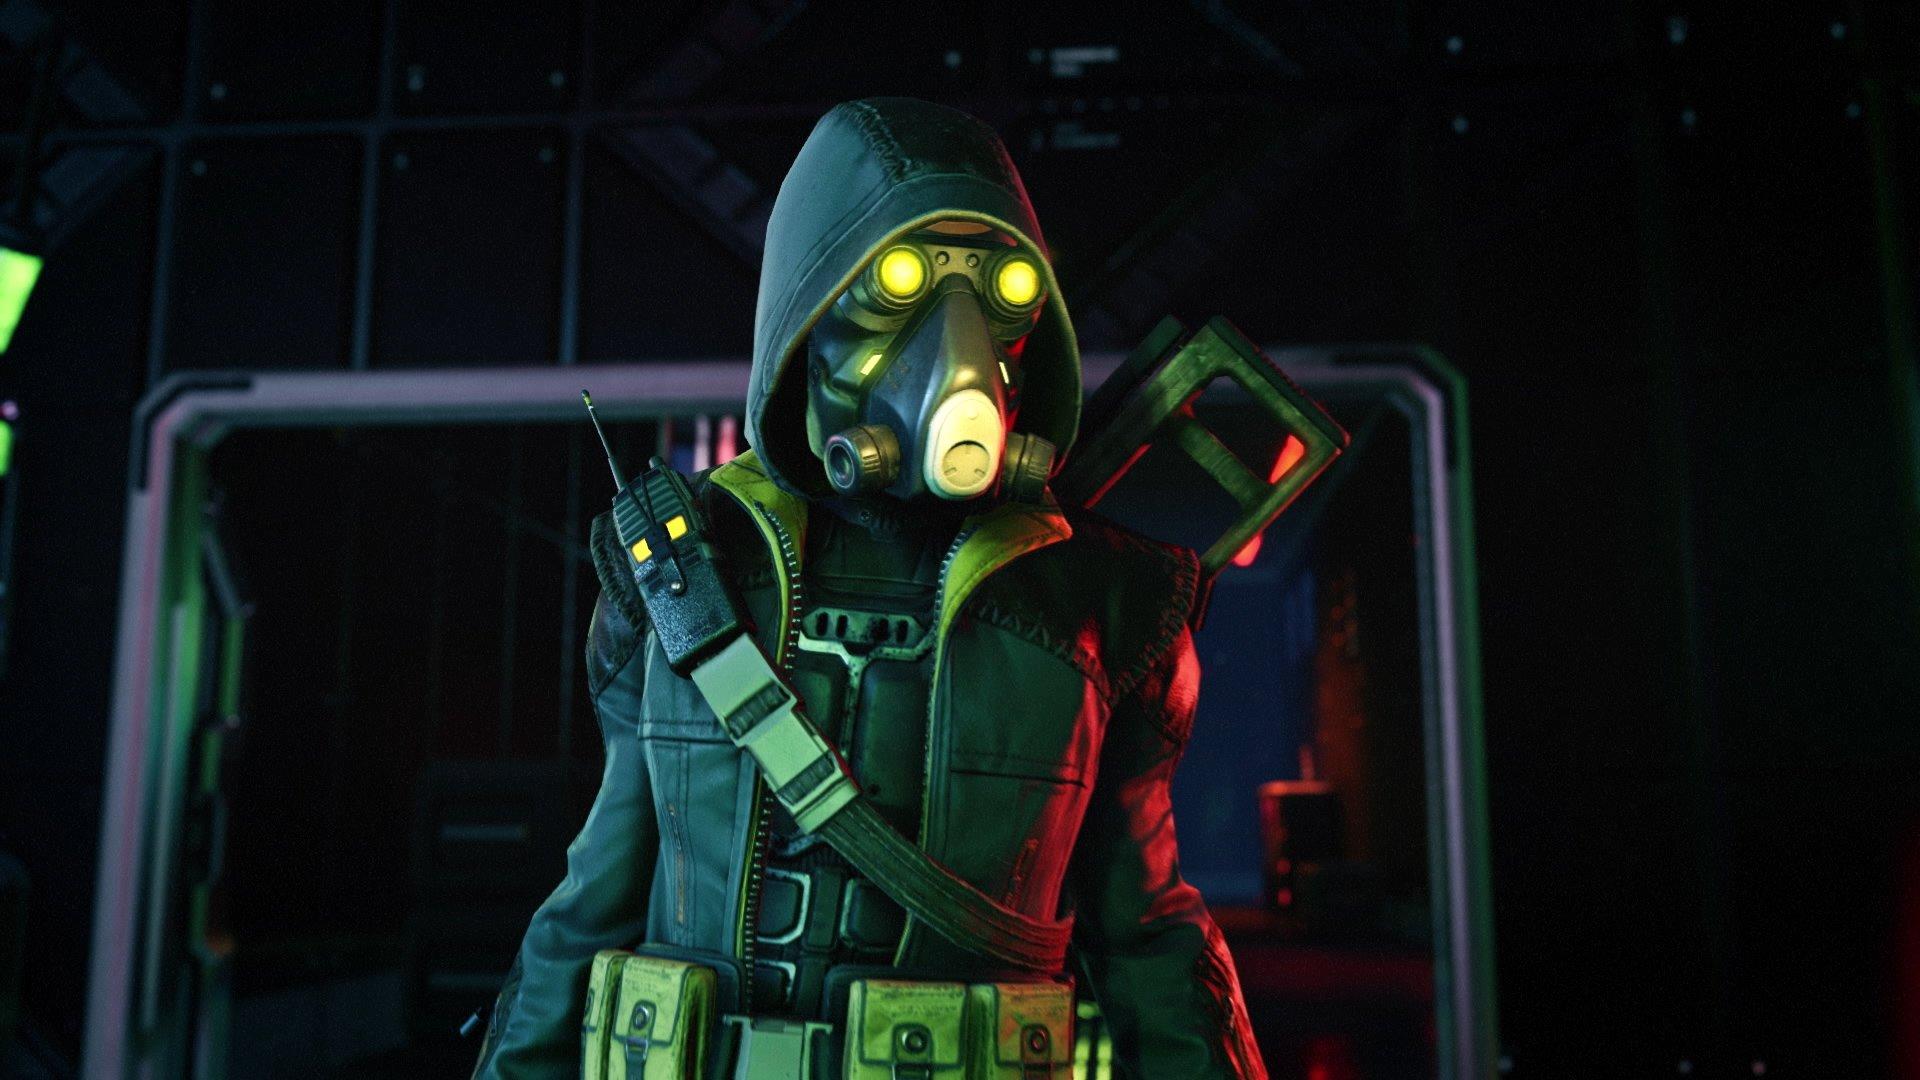 XCOM 2: War of the Chosen game image